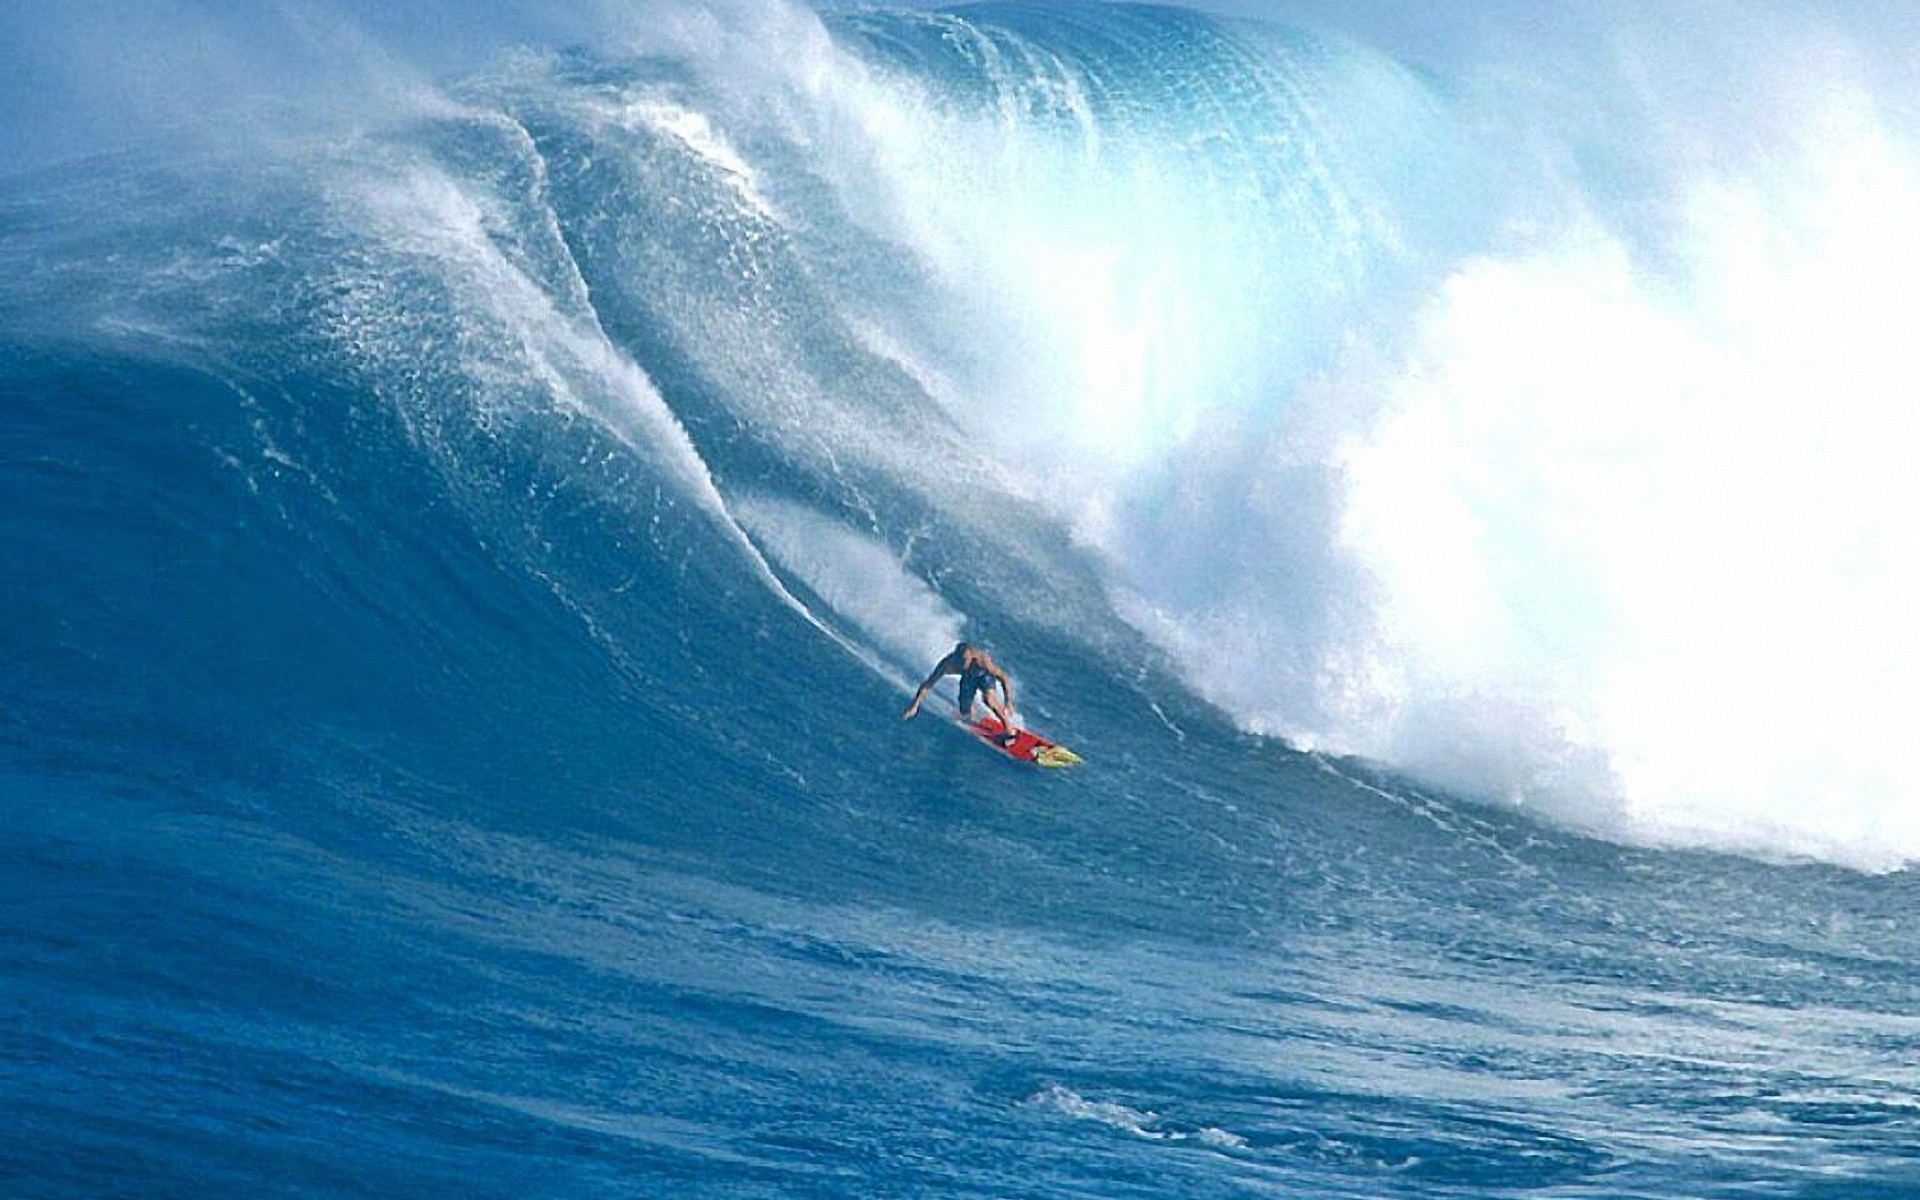 Previous: Surf …